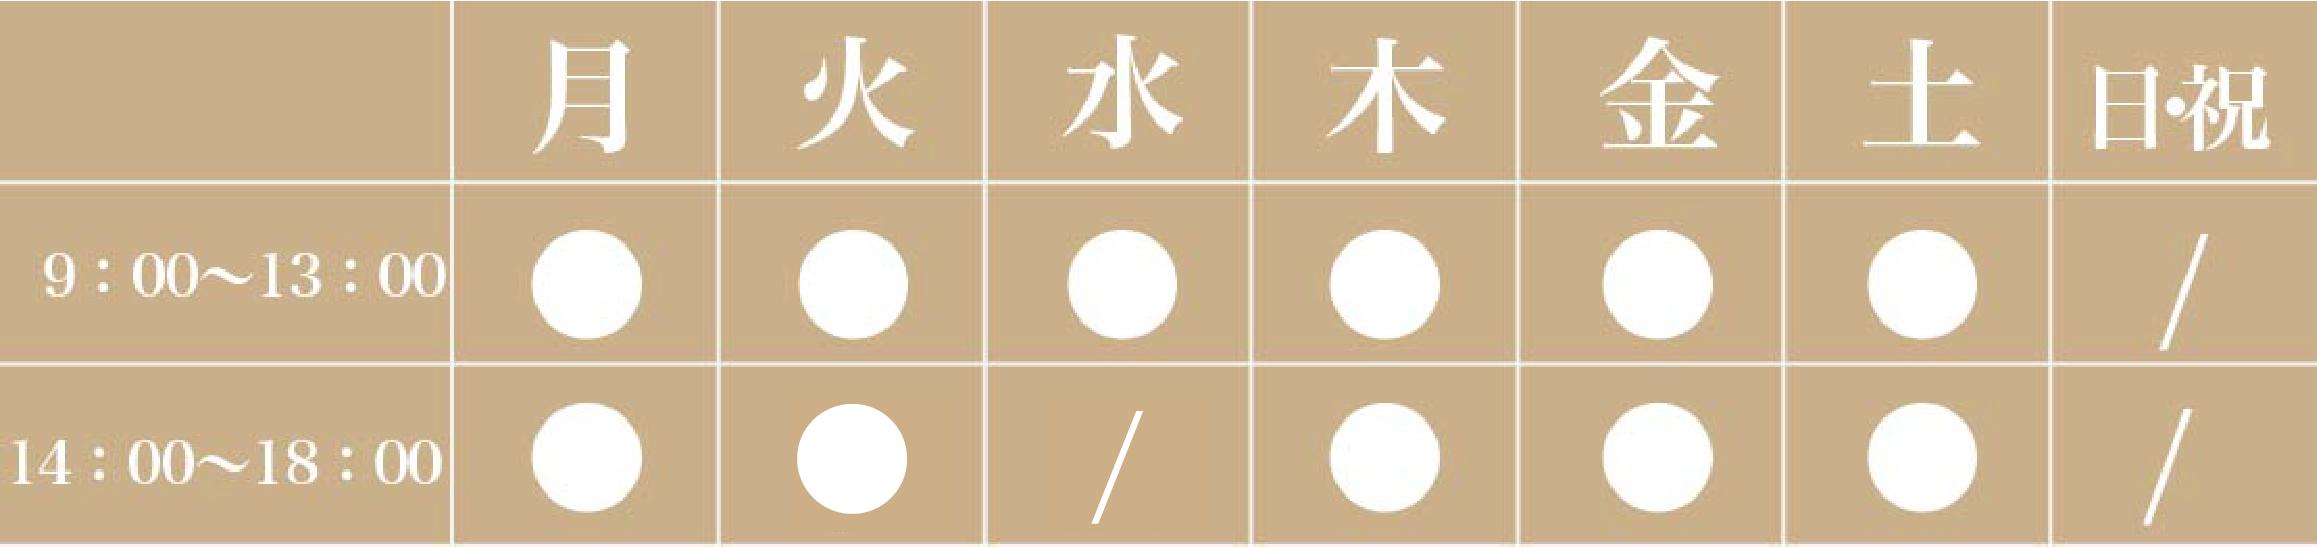 "suzuki 02 - <span style=""font-family: serif;"">ブログ"